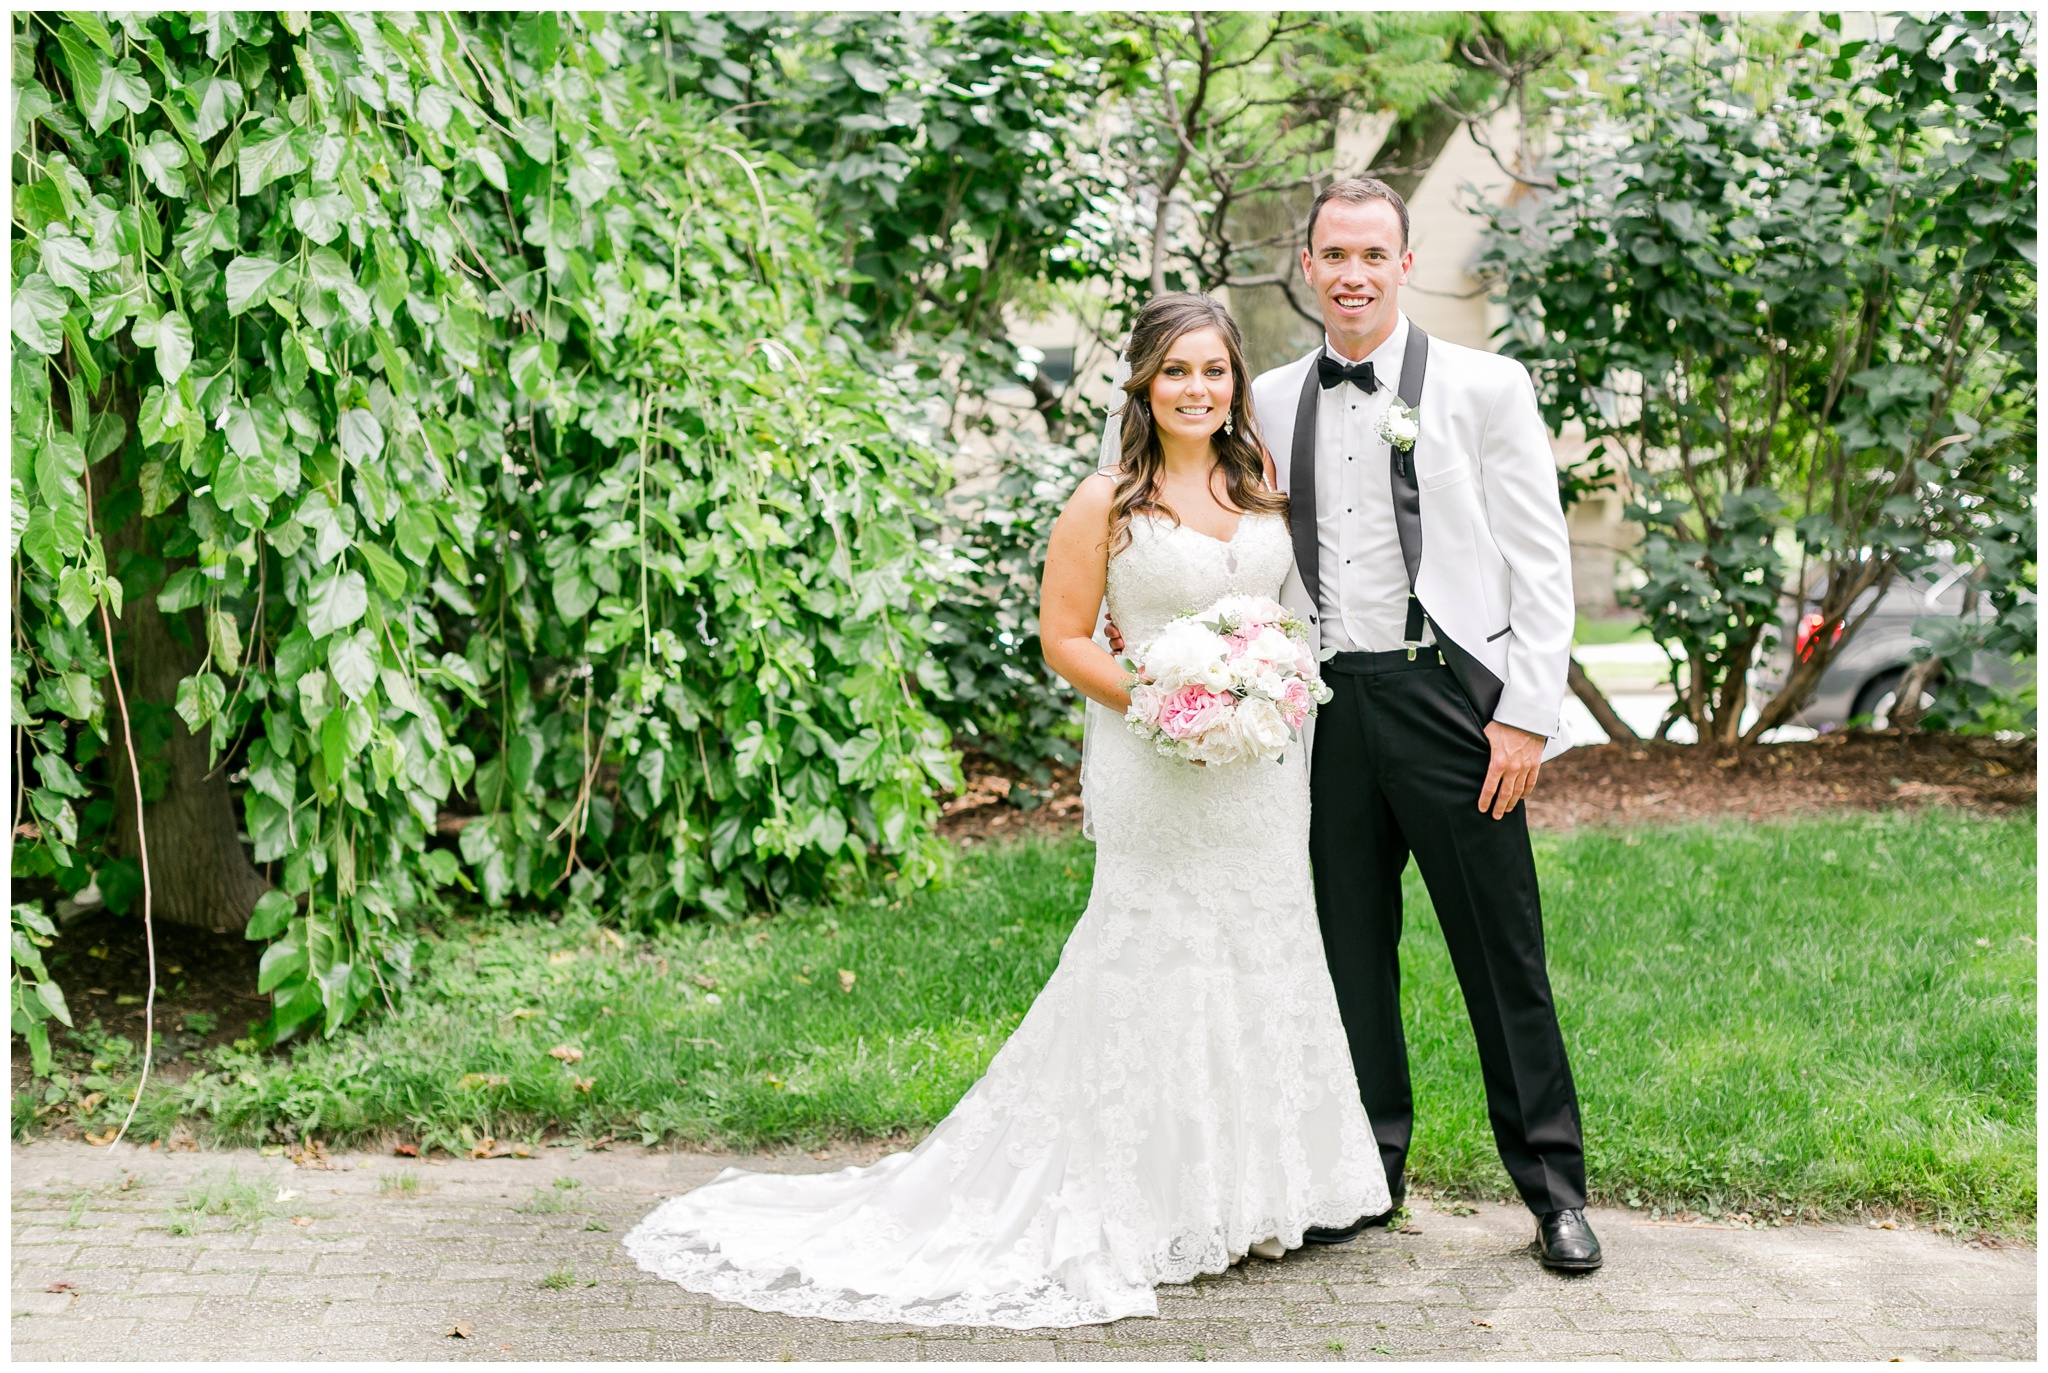 UW_Memorial_Union_wedding_madison_wisconsin_wedding_photographers_4591.jpg